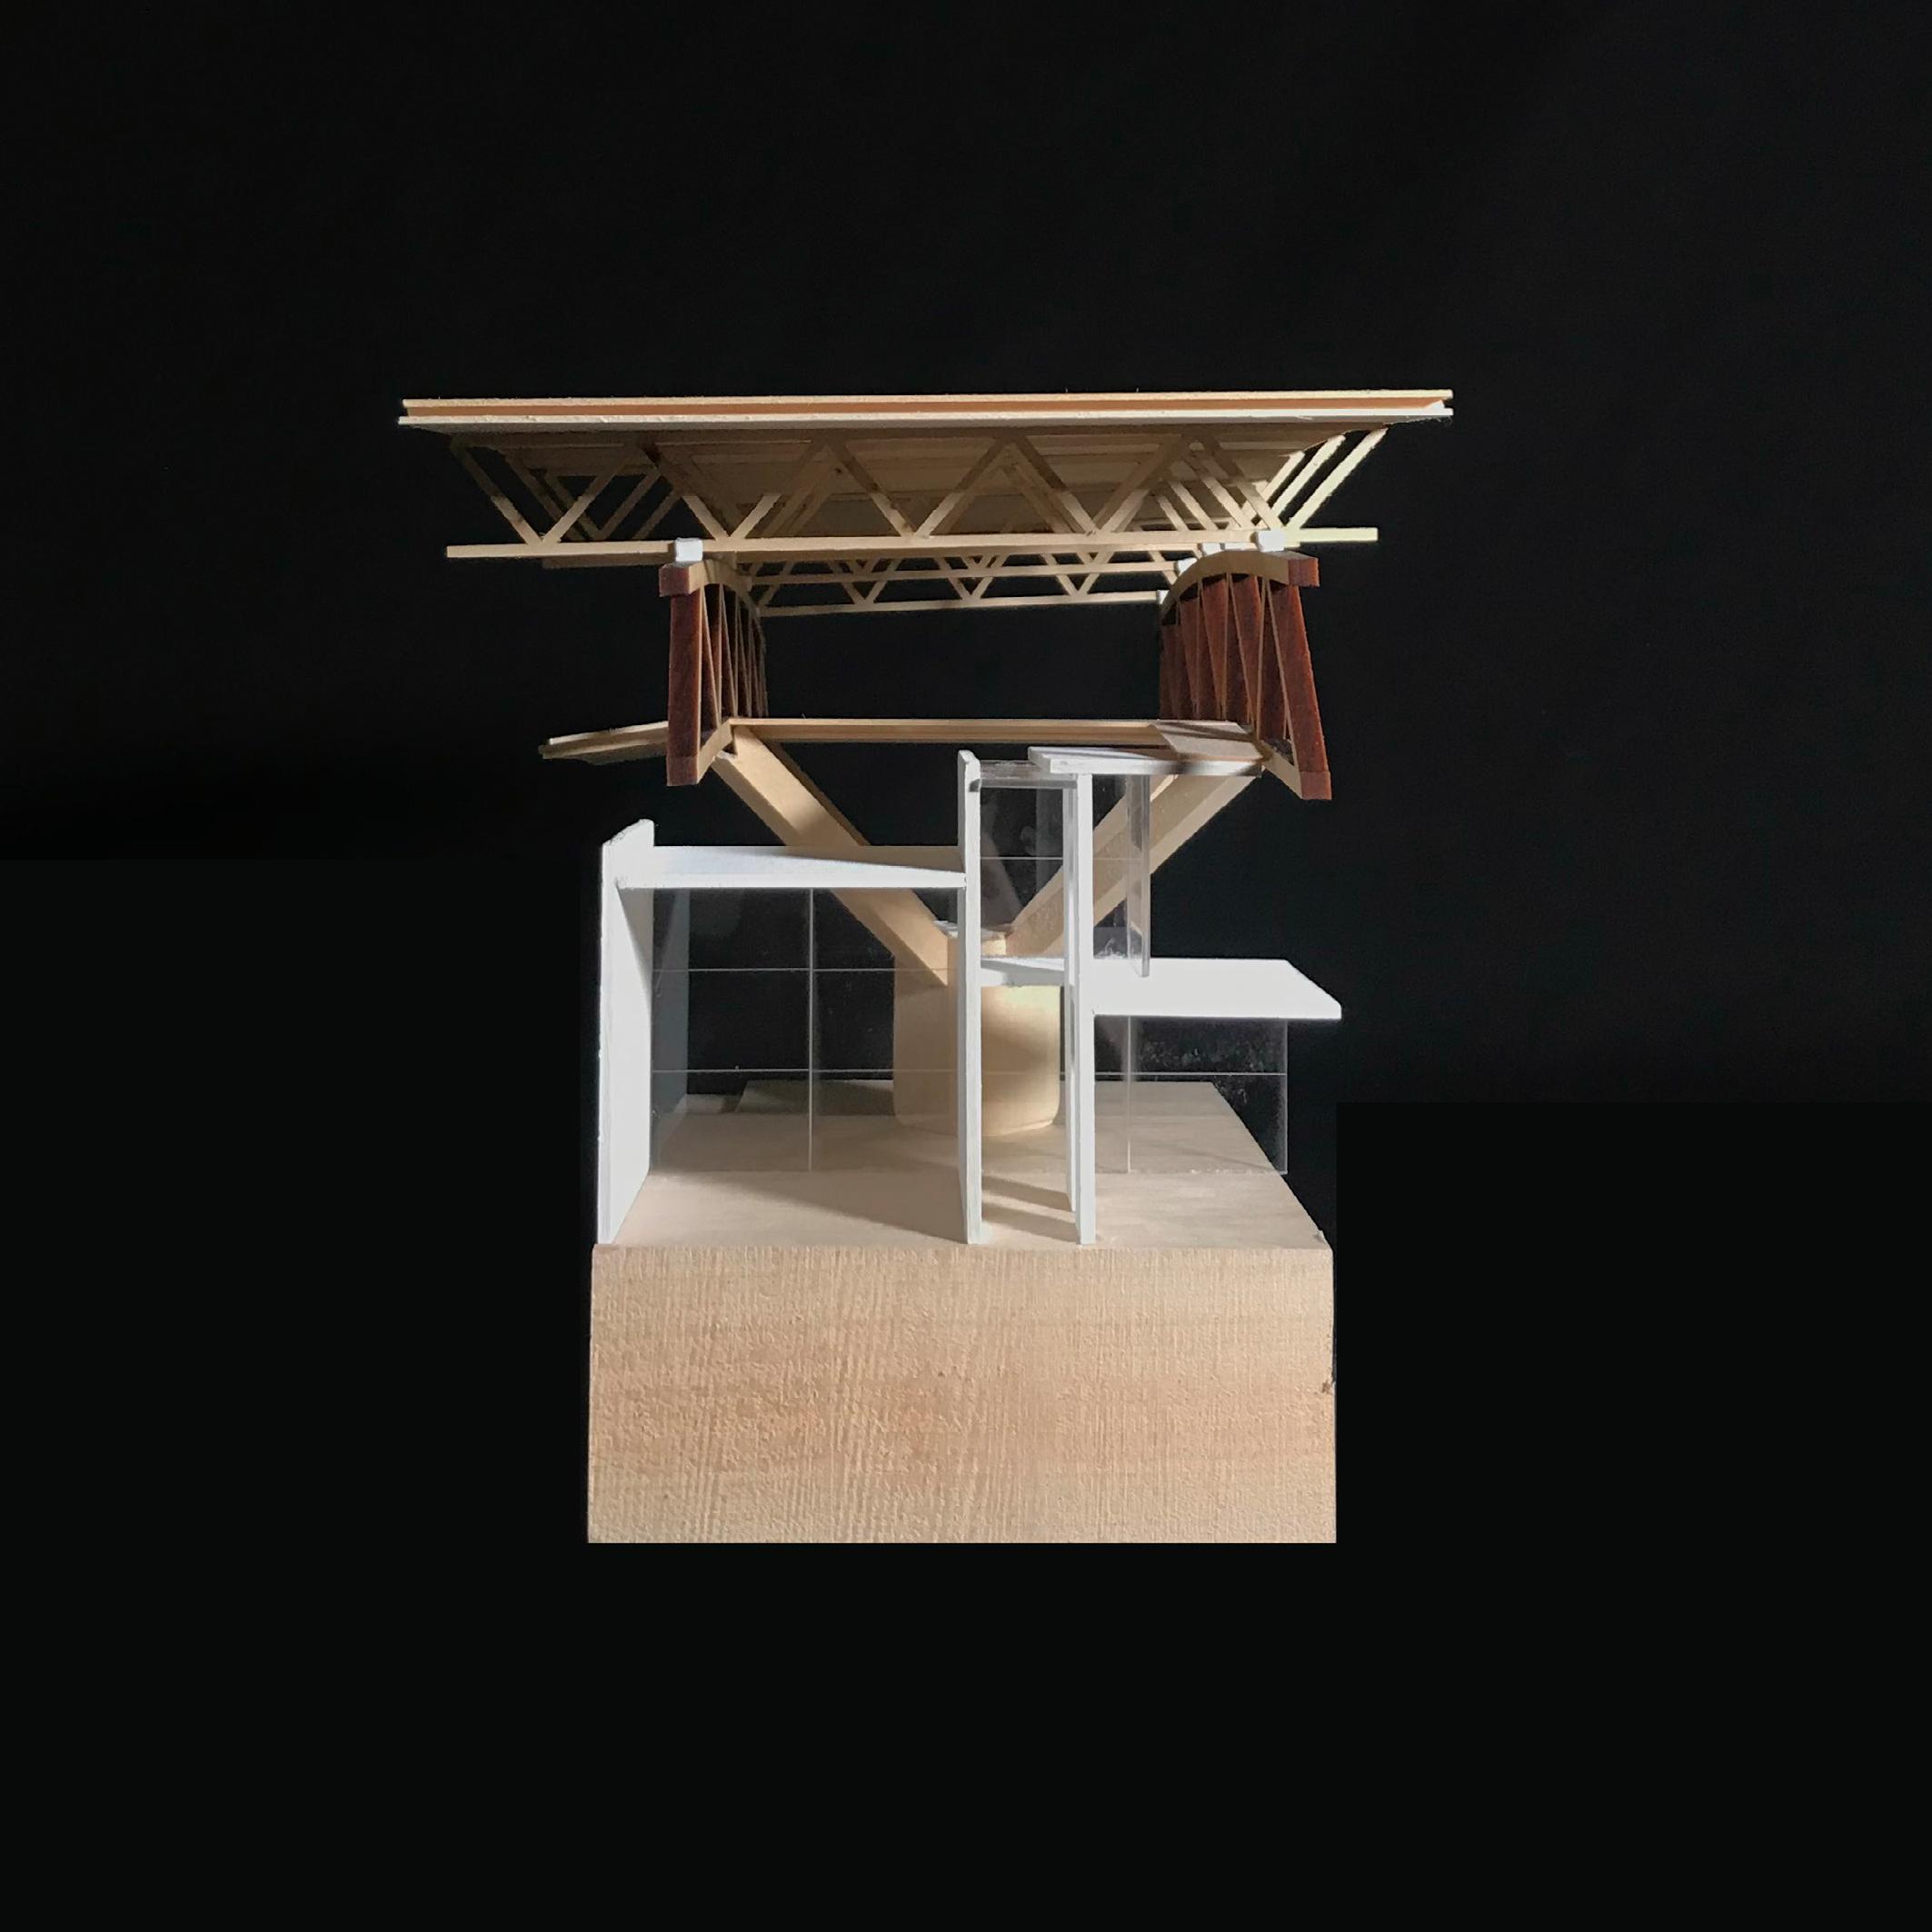 detail-model.png